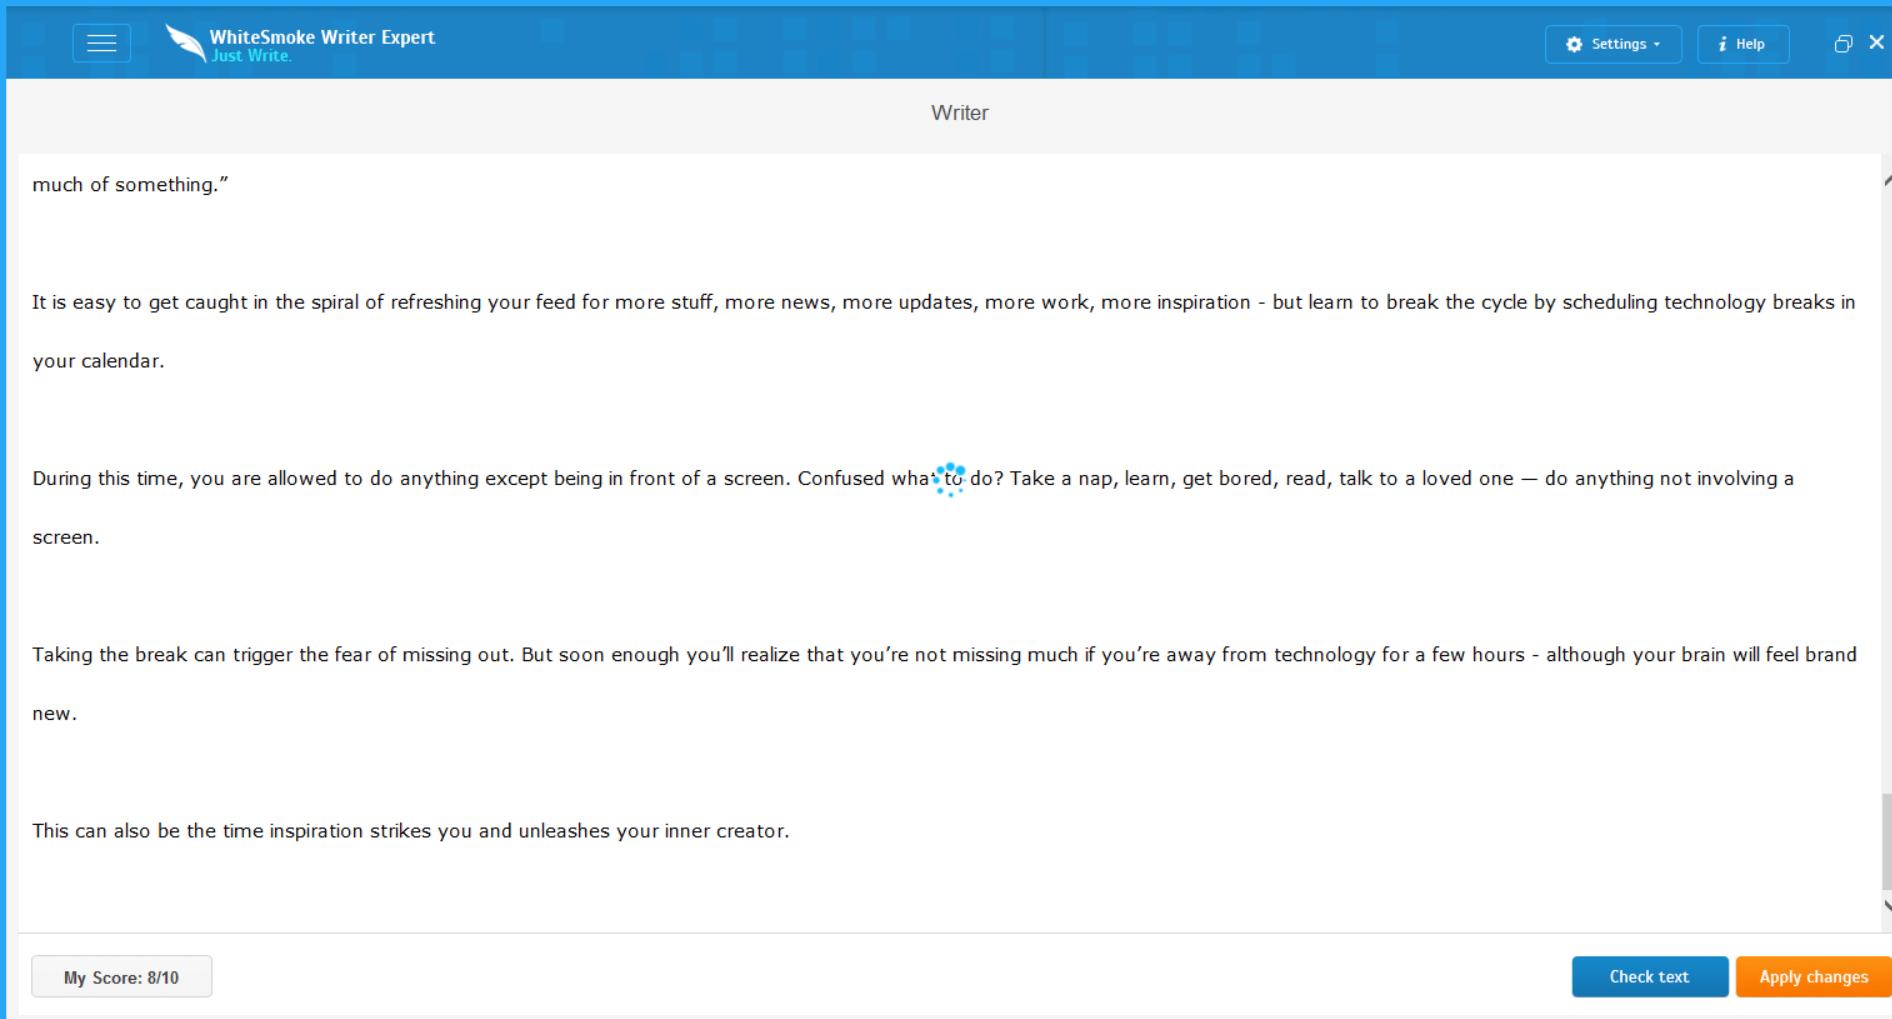 Whitesmoke review: Plagiarism Checker